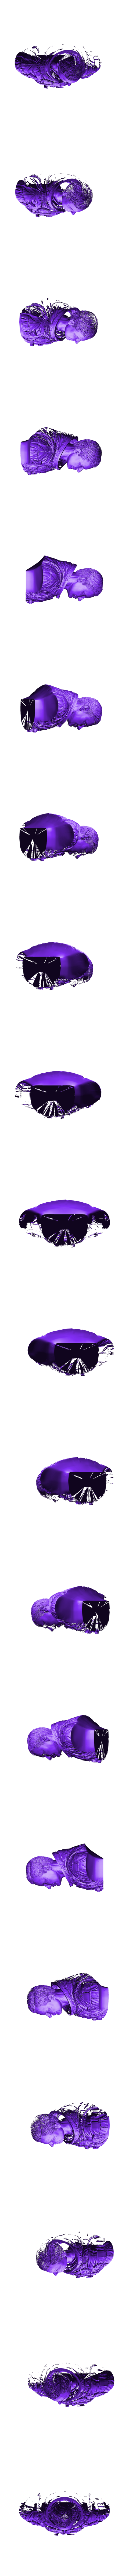 astronaut_bust_high.stl Download free STL file Astronaut Bust • 3D printing design, LSMiniatures